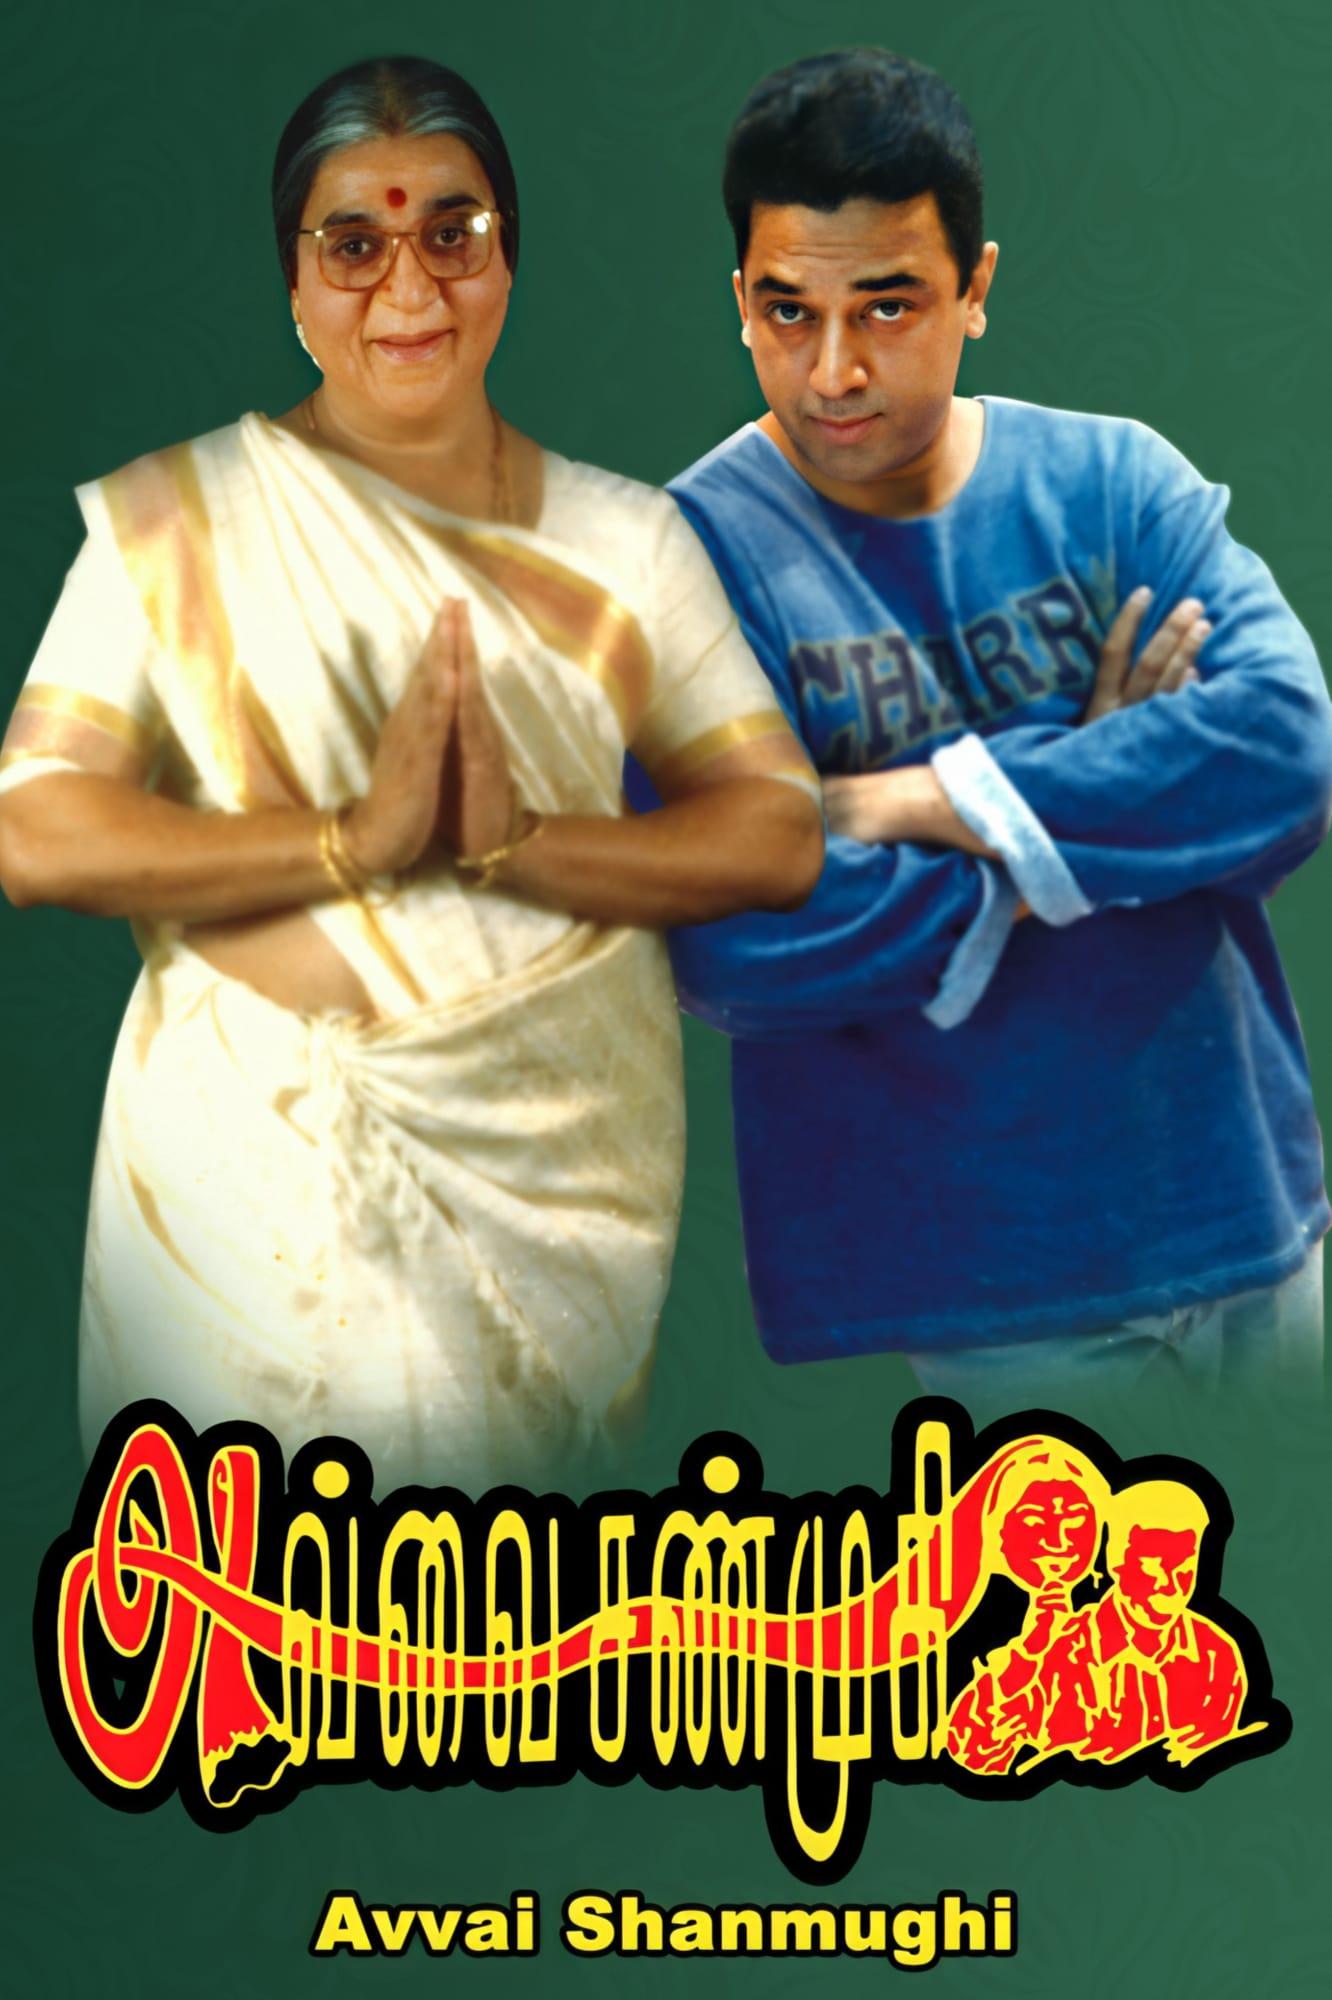 Avvai Shanmugi Movie Streaming Online Watch on Amazon, Google Play, Manorama MAX, Youtube